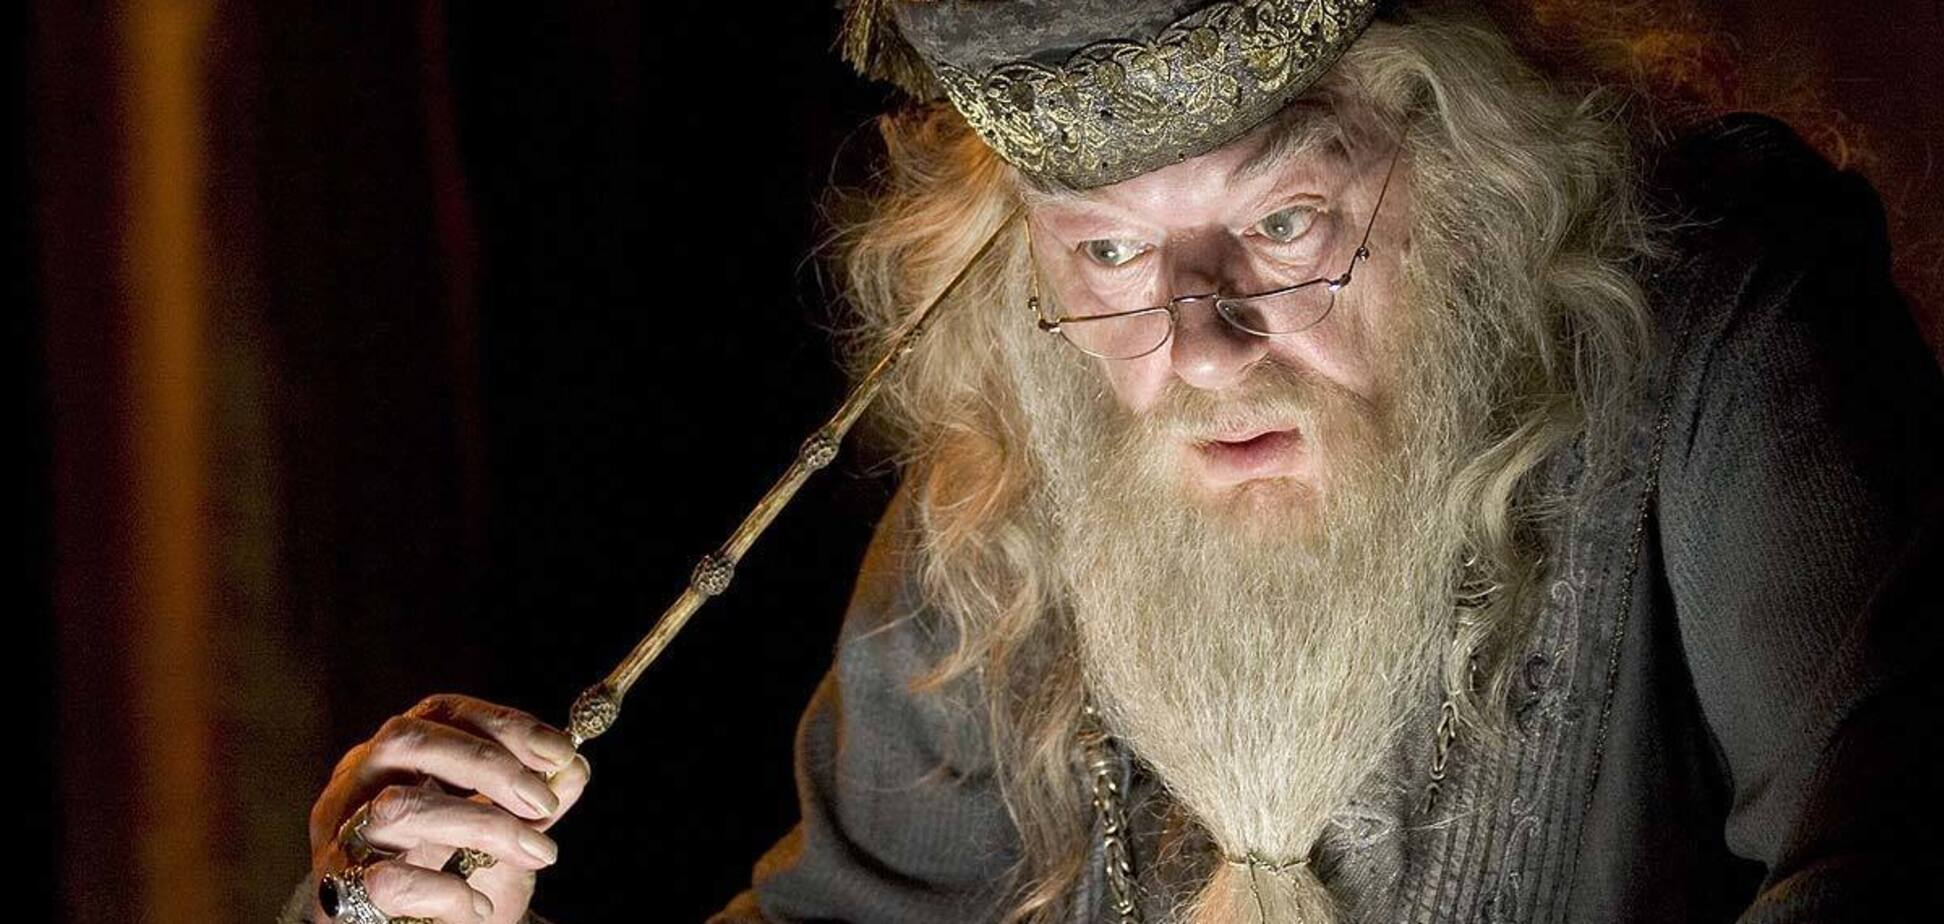 На звезду 'Гарри Поттера' подали в суд из-за ДТП